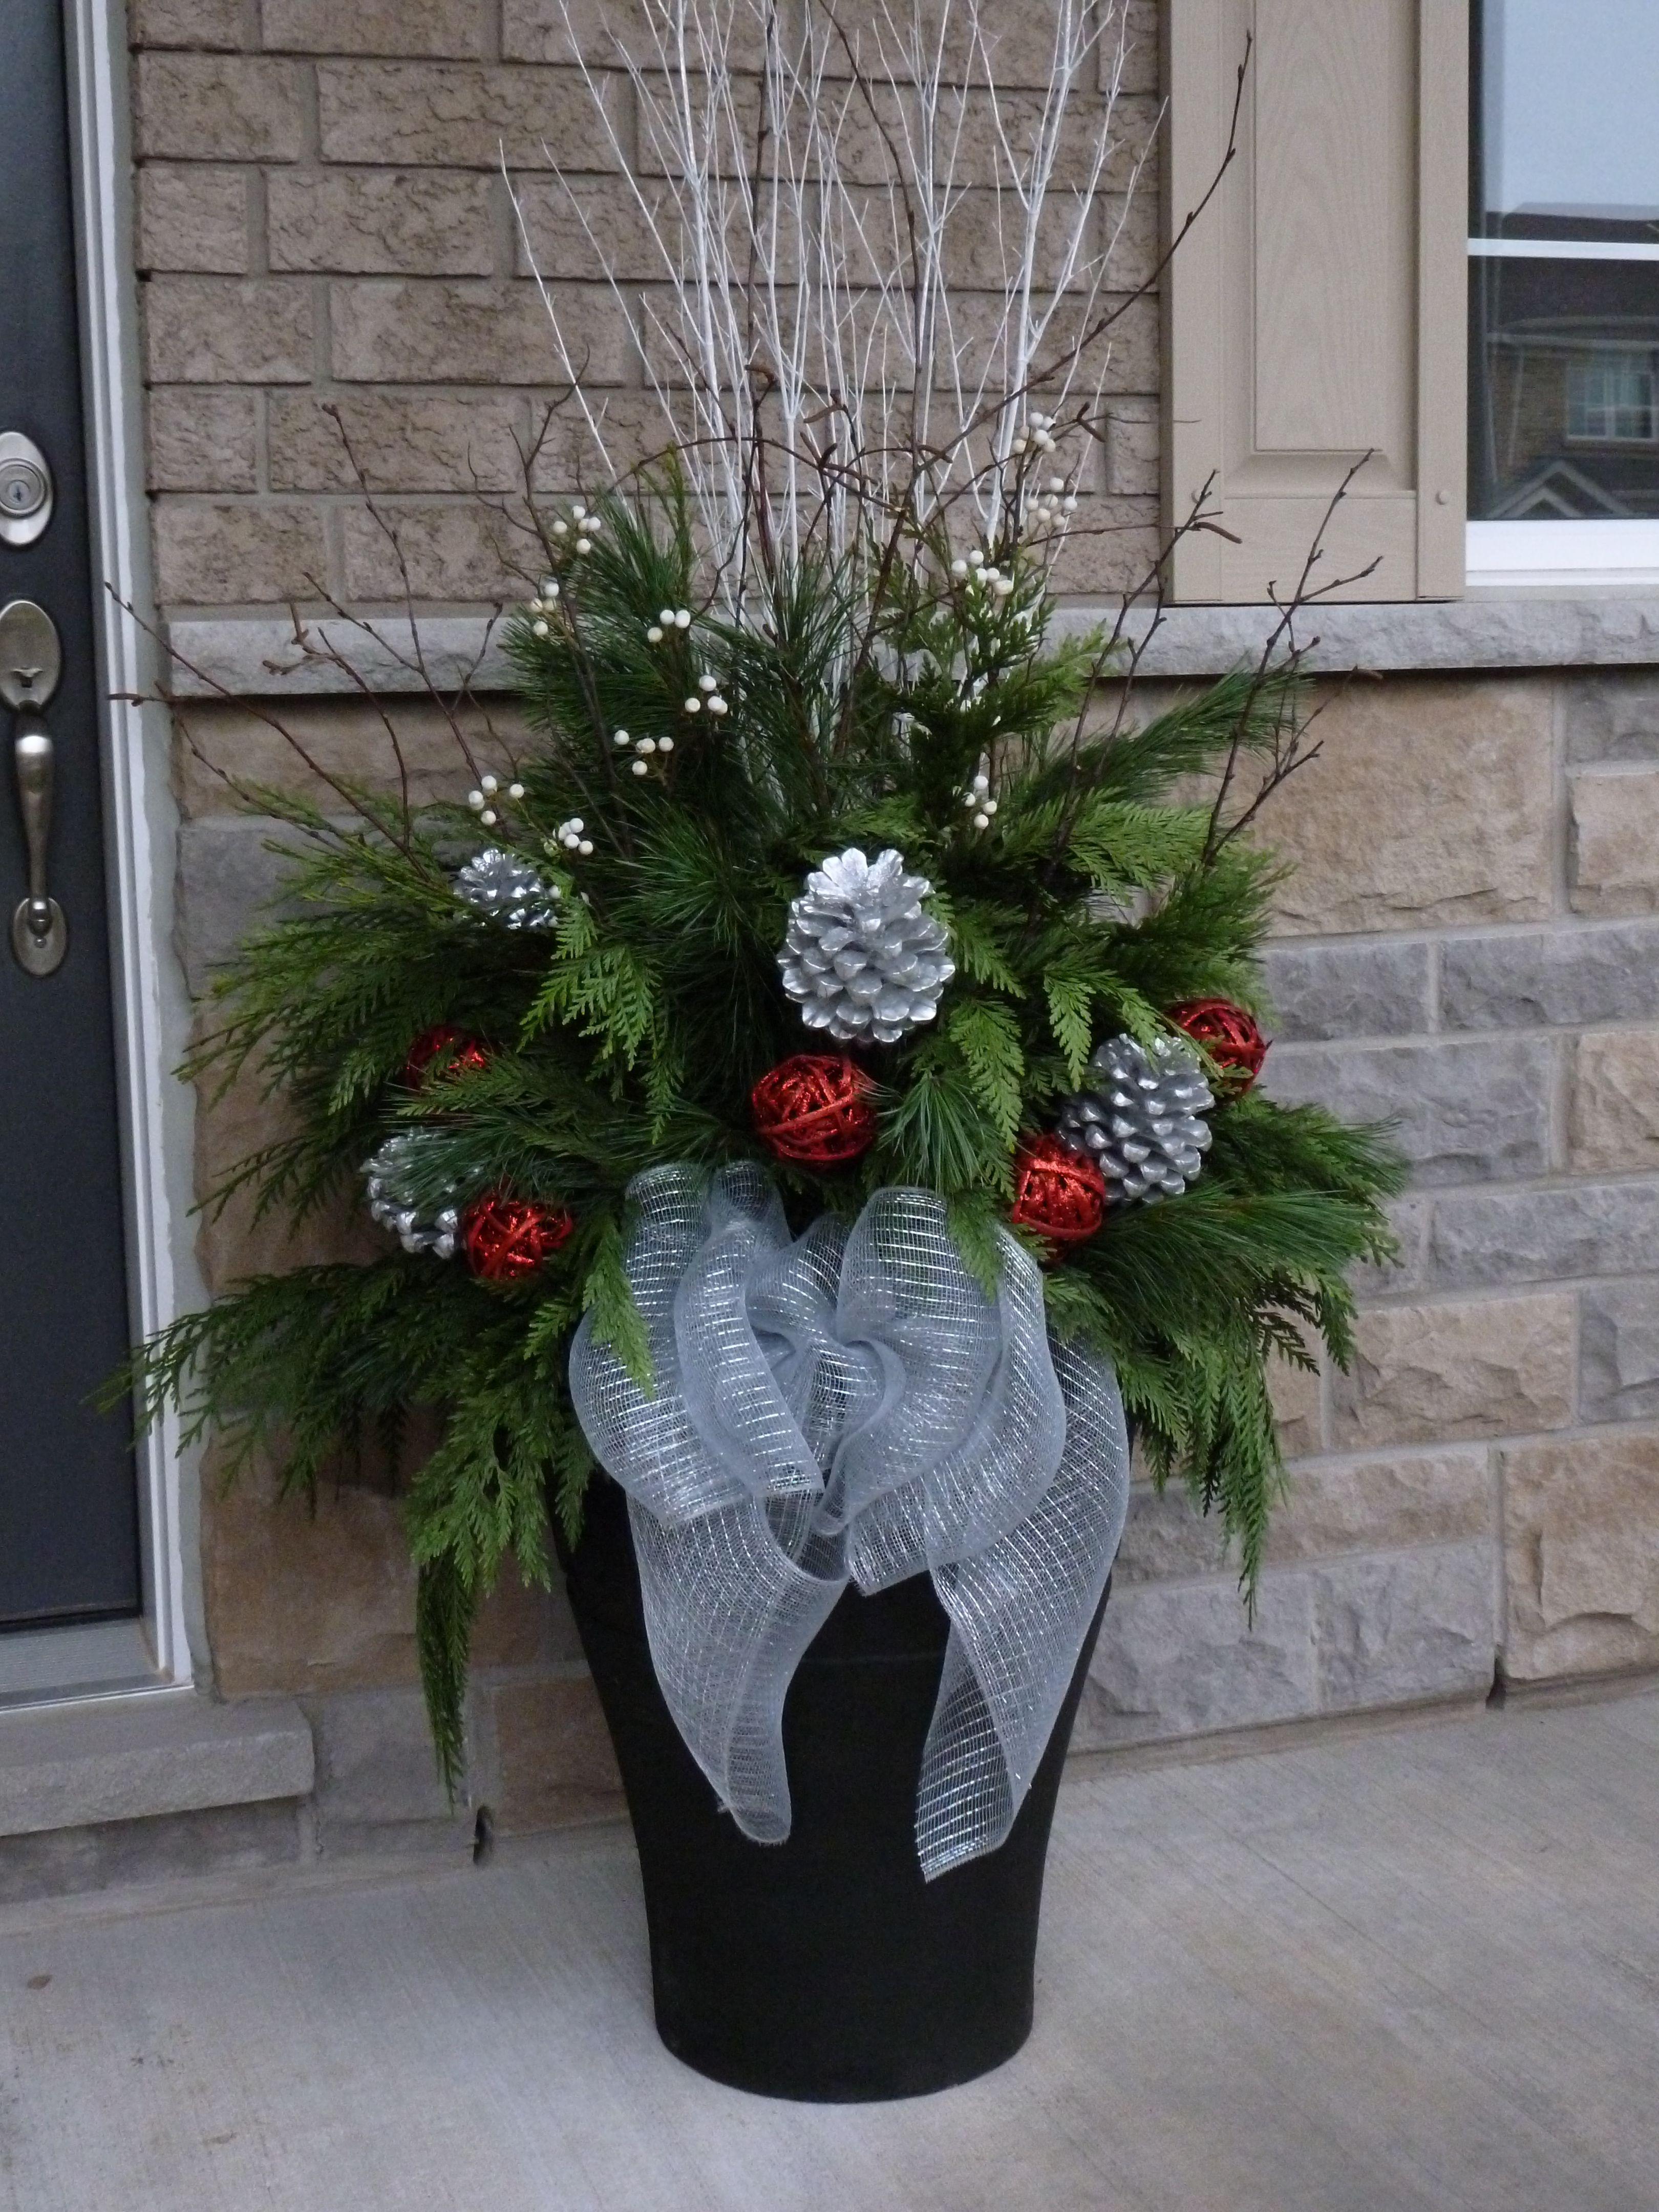 Christmas Decorating Ideas For Outdoor Urns : Christmas planter decor